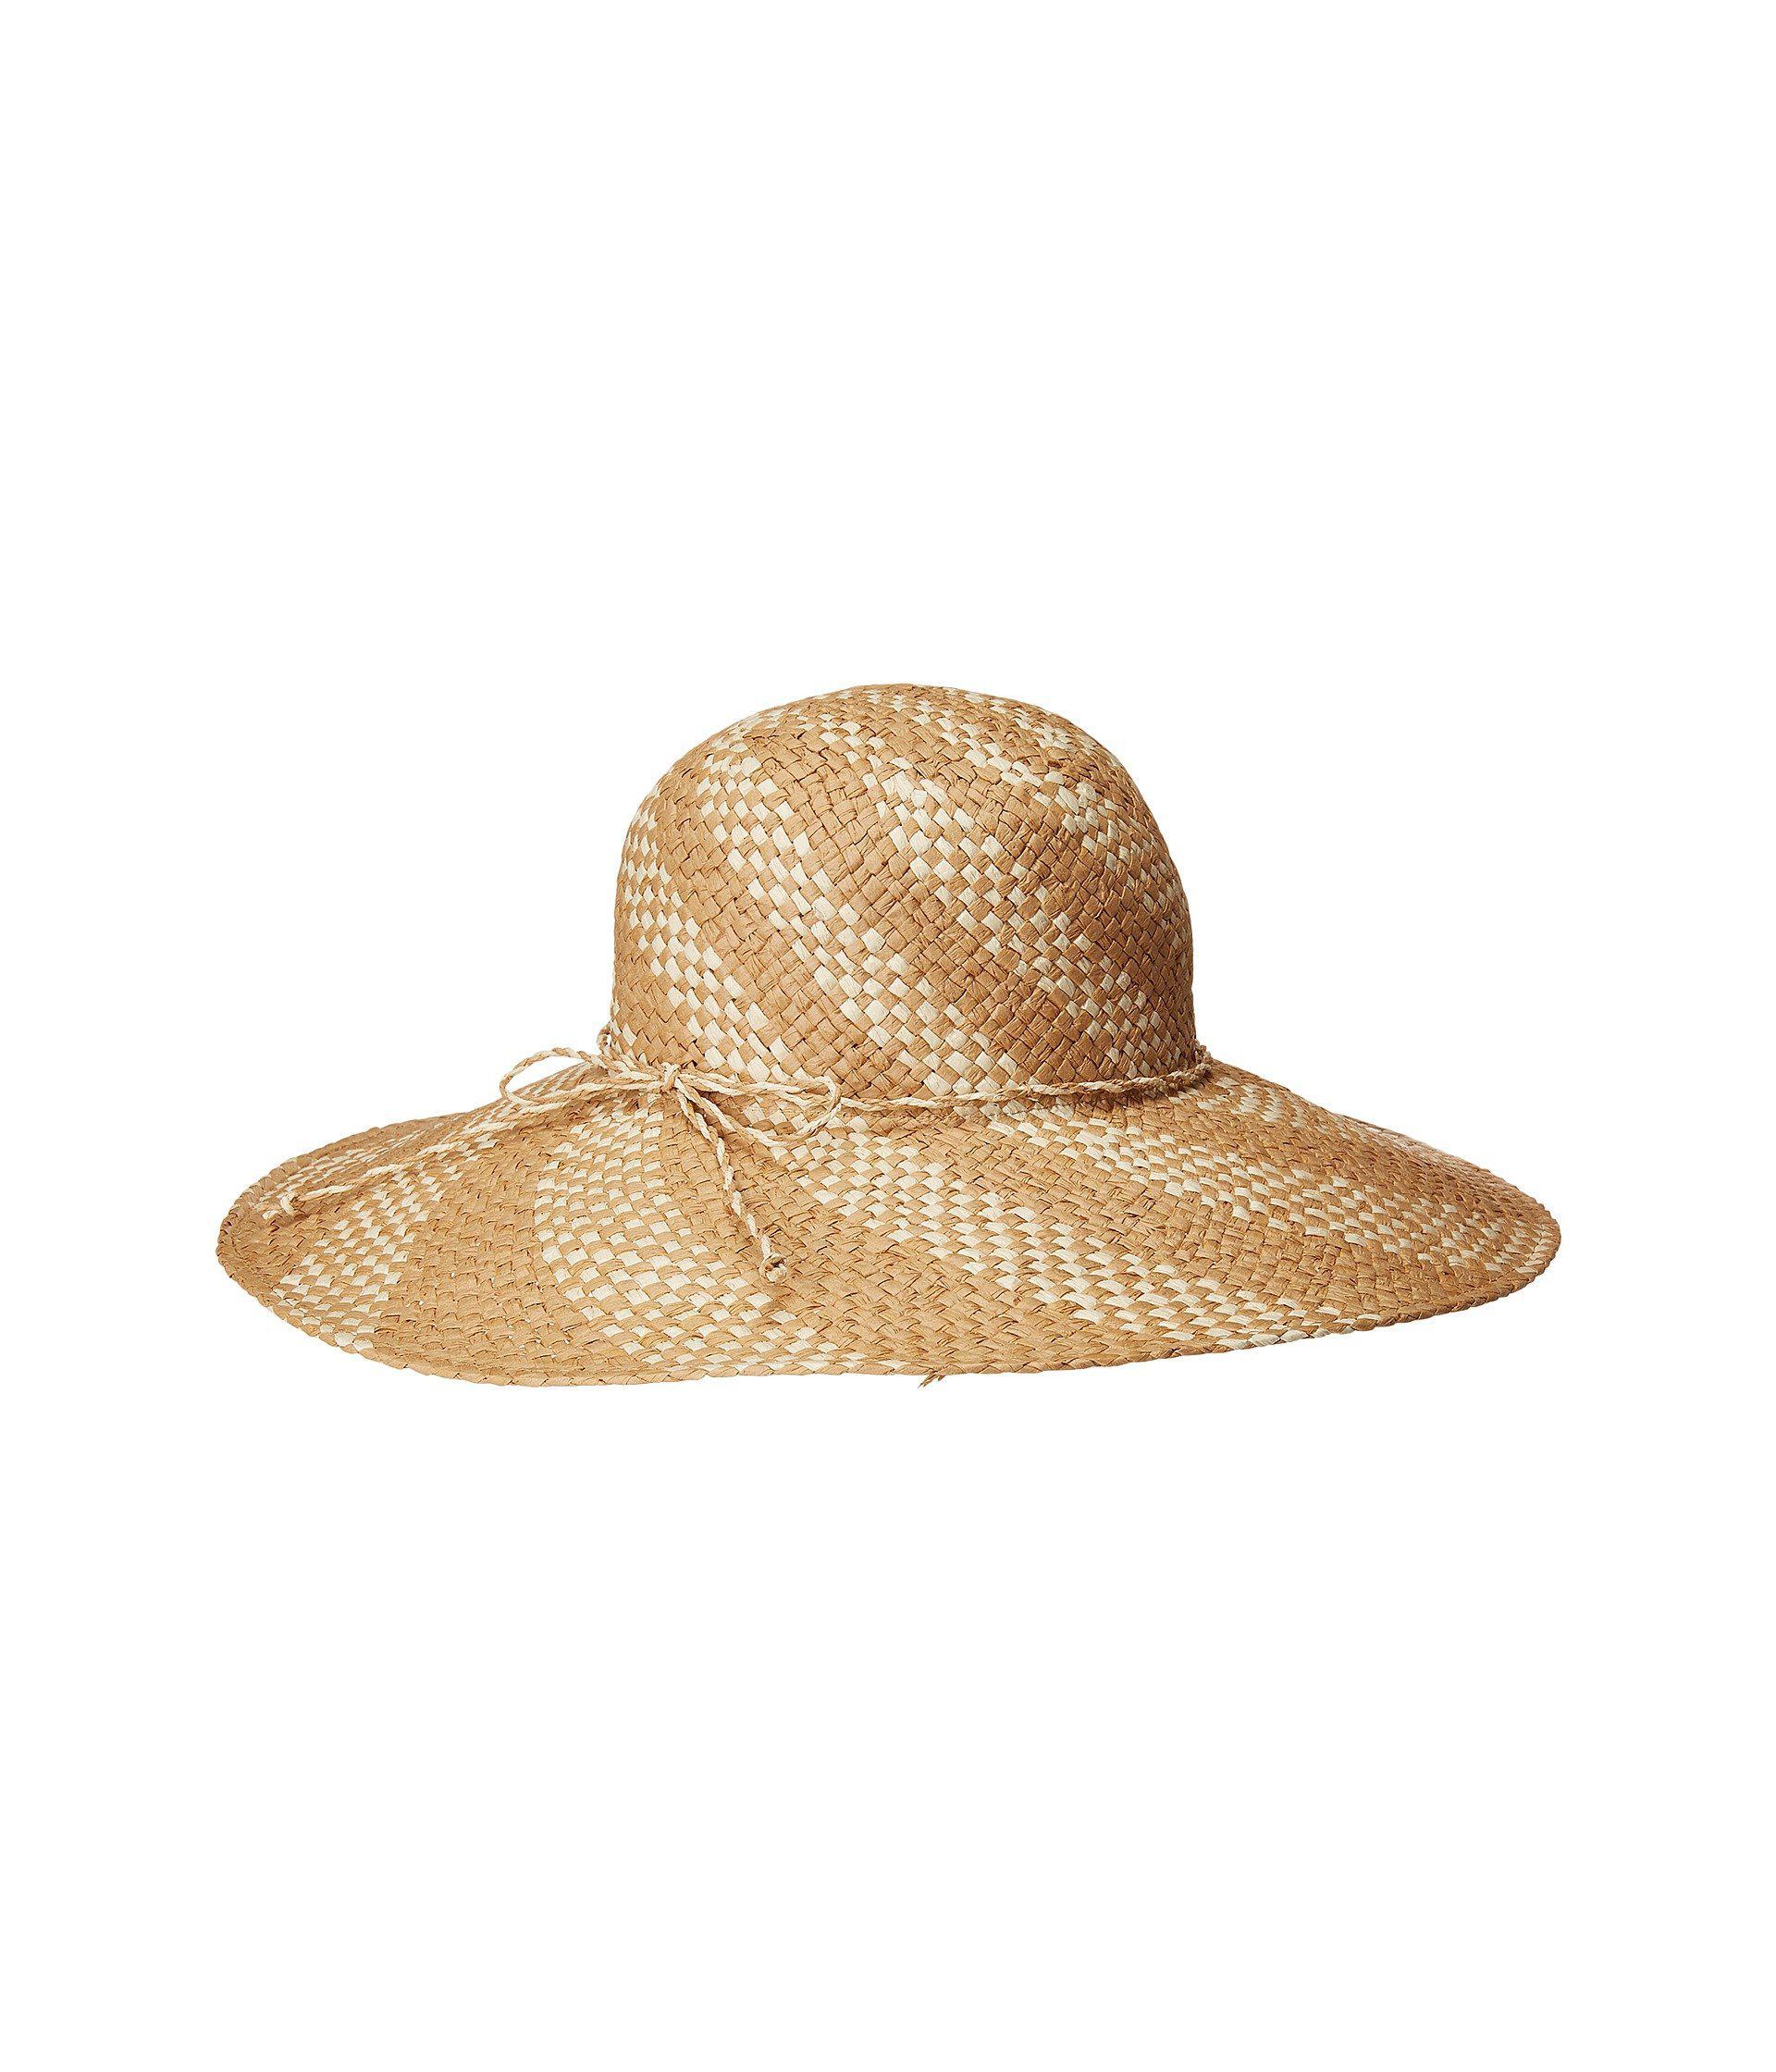 San Diego Hat Company - Pbl3089os Spiral Woven Paper Sun Brim (natural black).  View fullscreen e1411cfeb33e